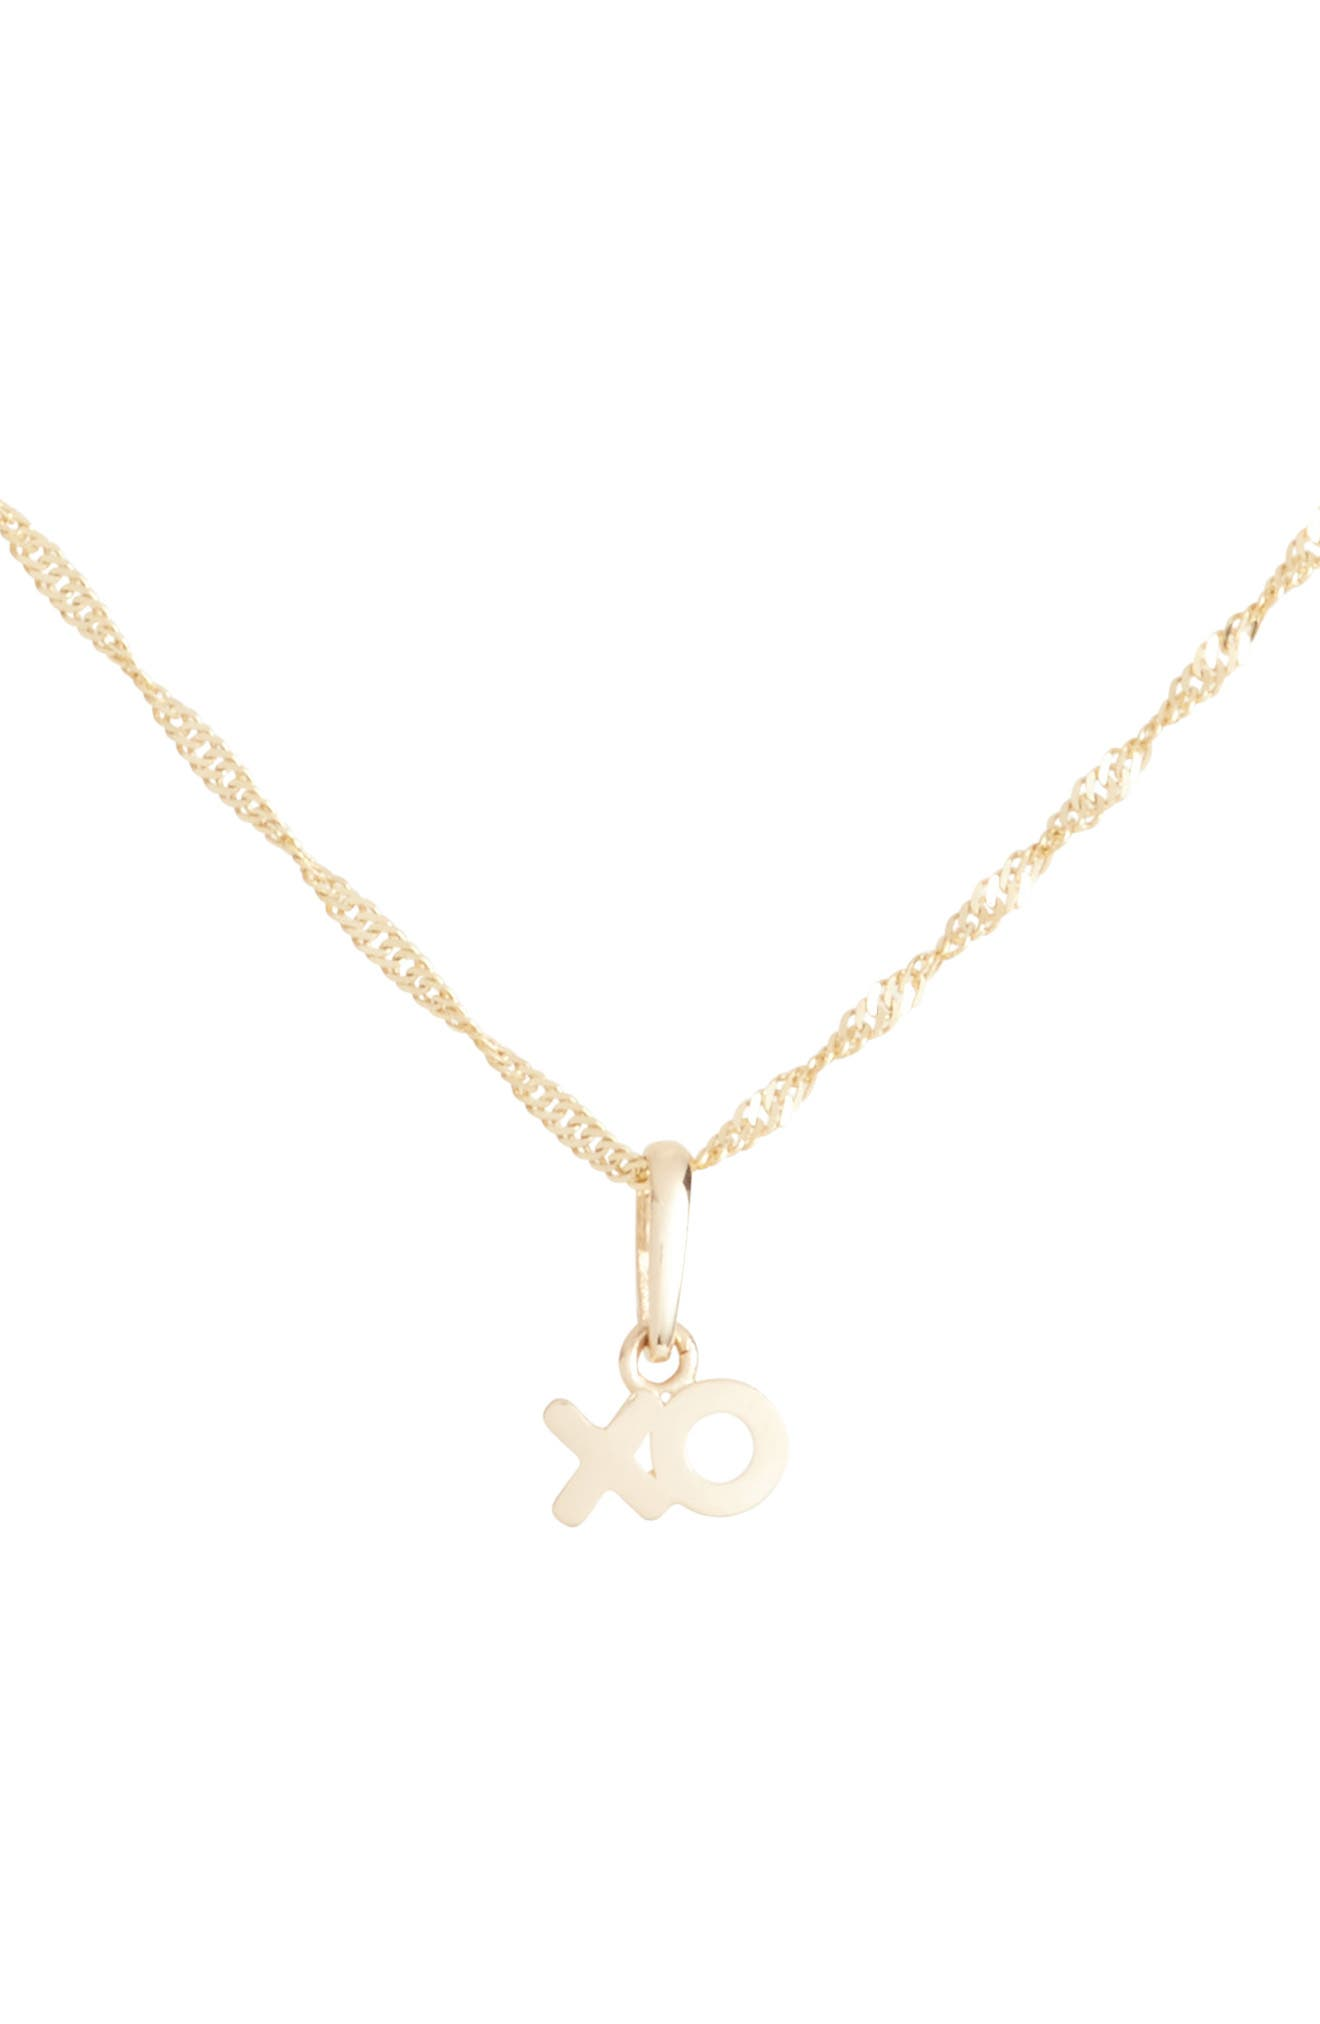 XO Charm Short Pendant Necklace,                         Main,                         color, Yellow Gold